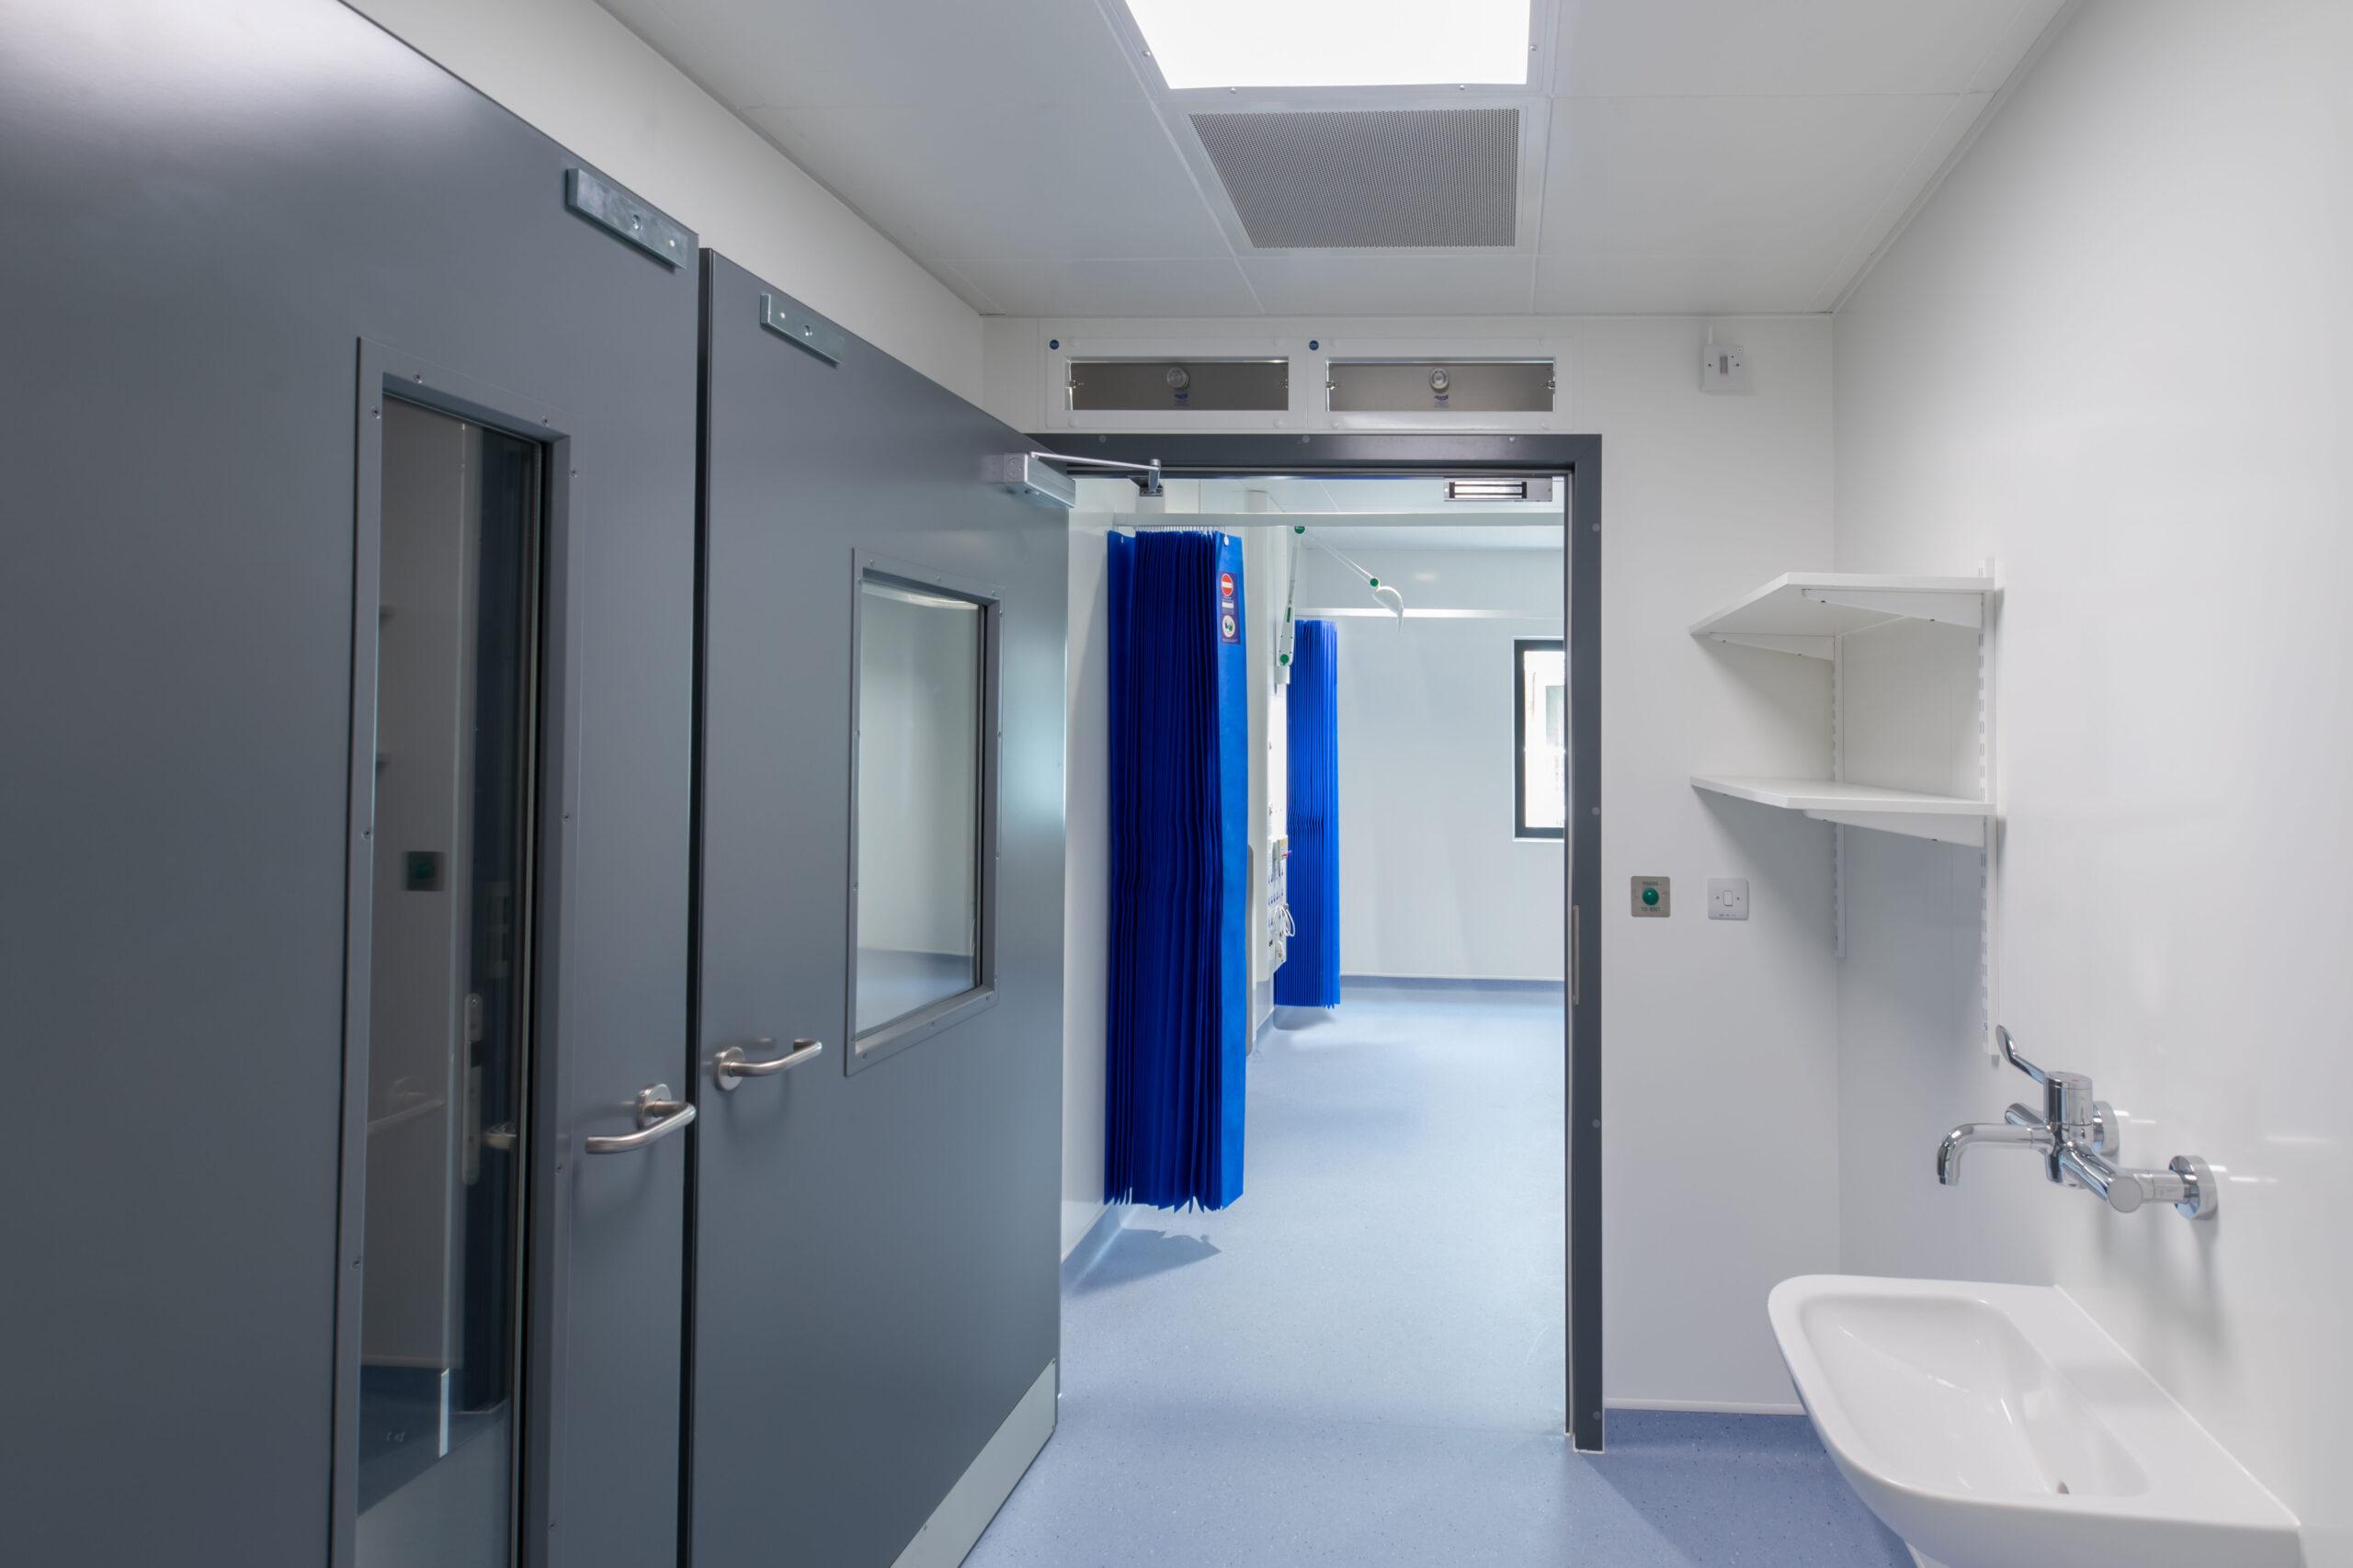 isolation ward design